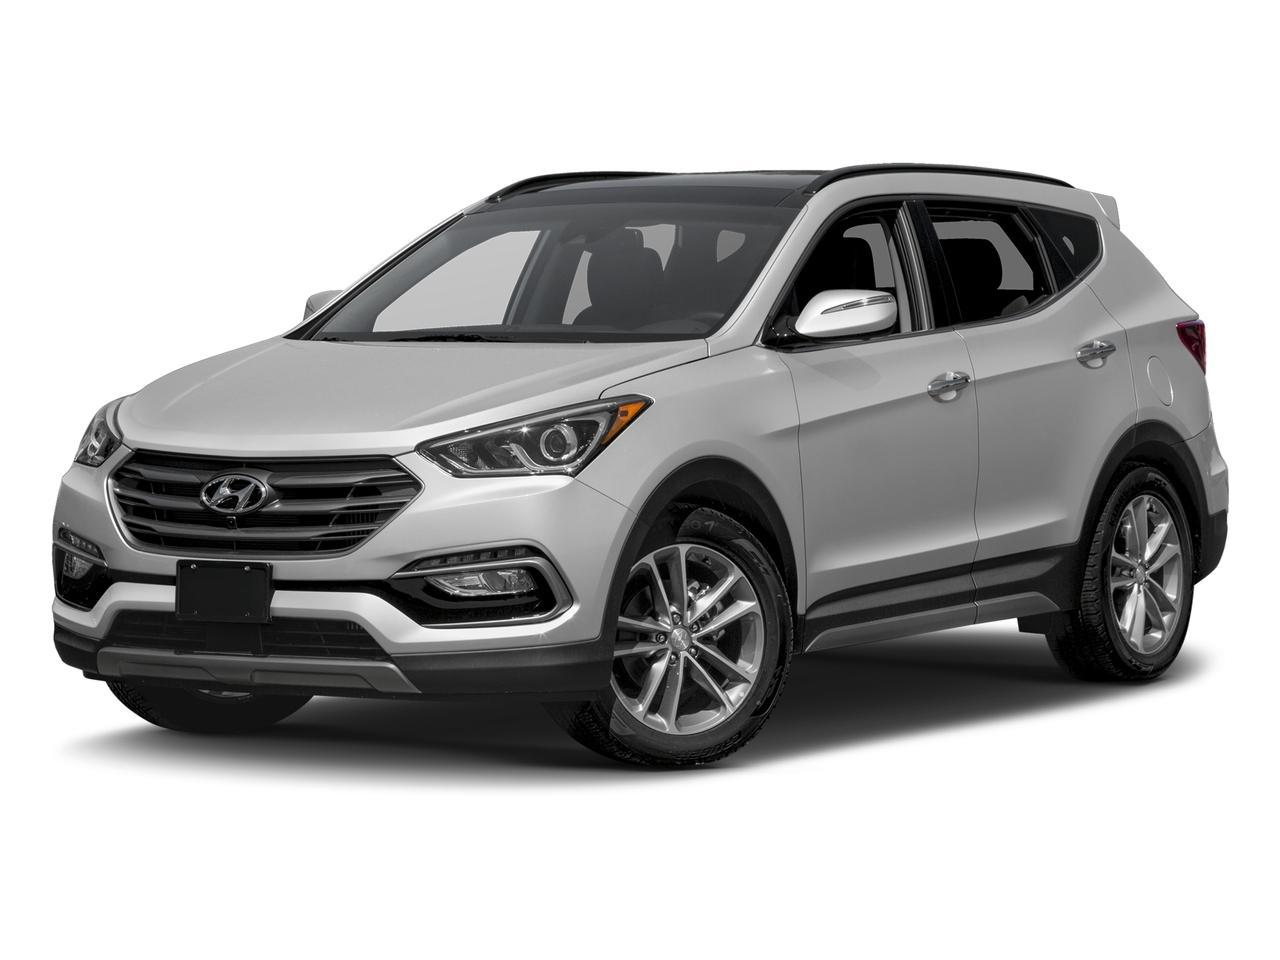 2017 Hyundai Santa Fe Sport Vehicle Photo in Mission, TX 78572